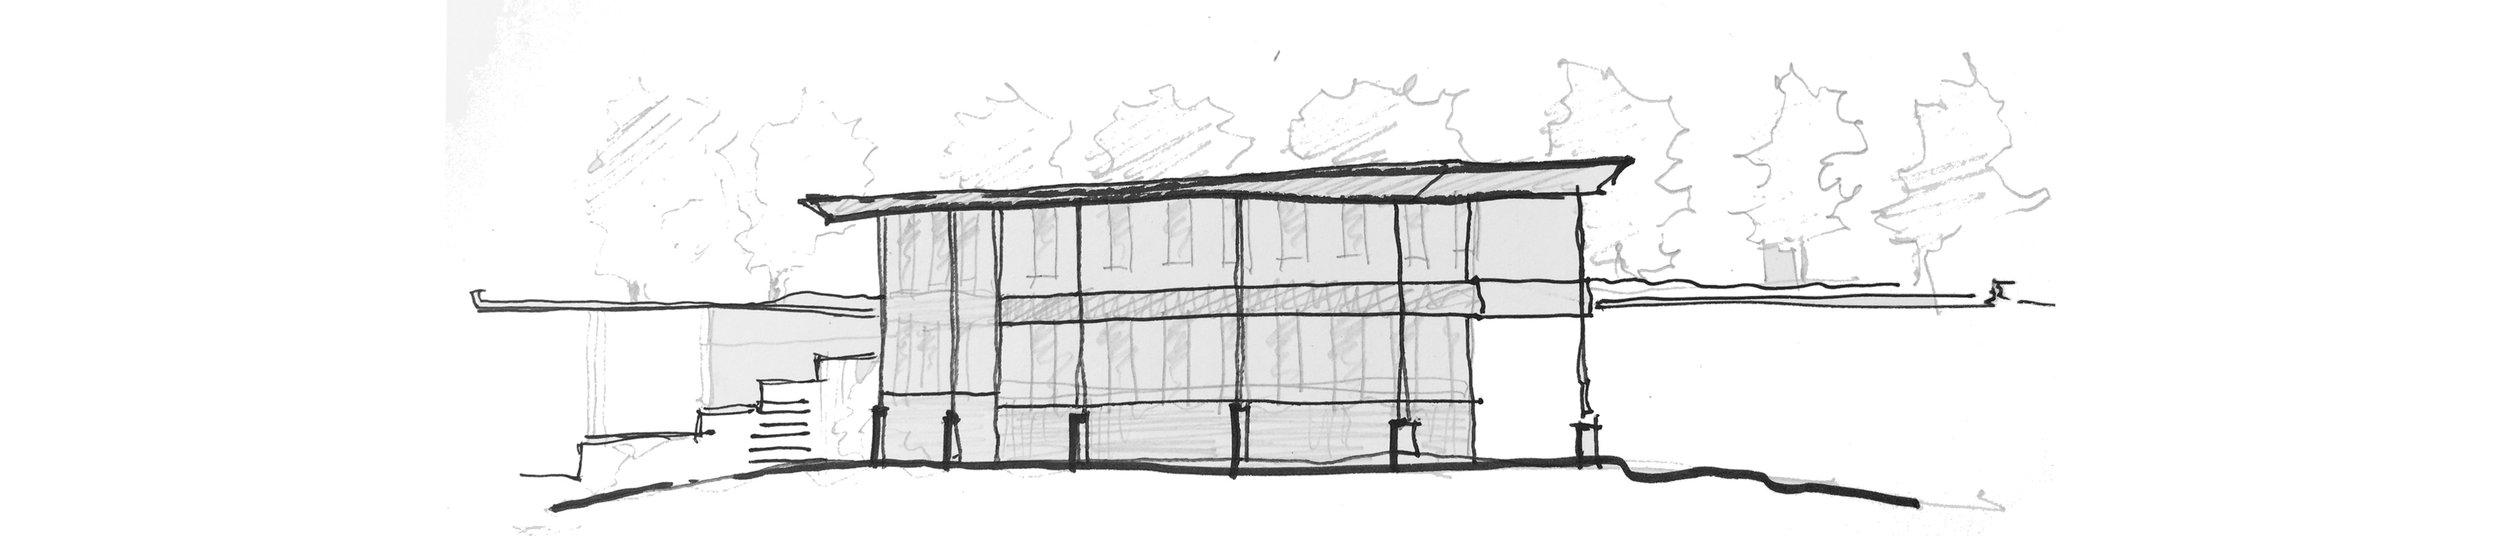 frick sketch section.jpg